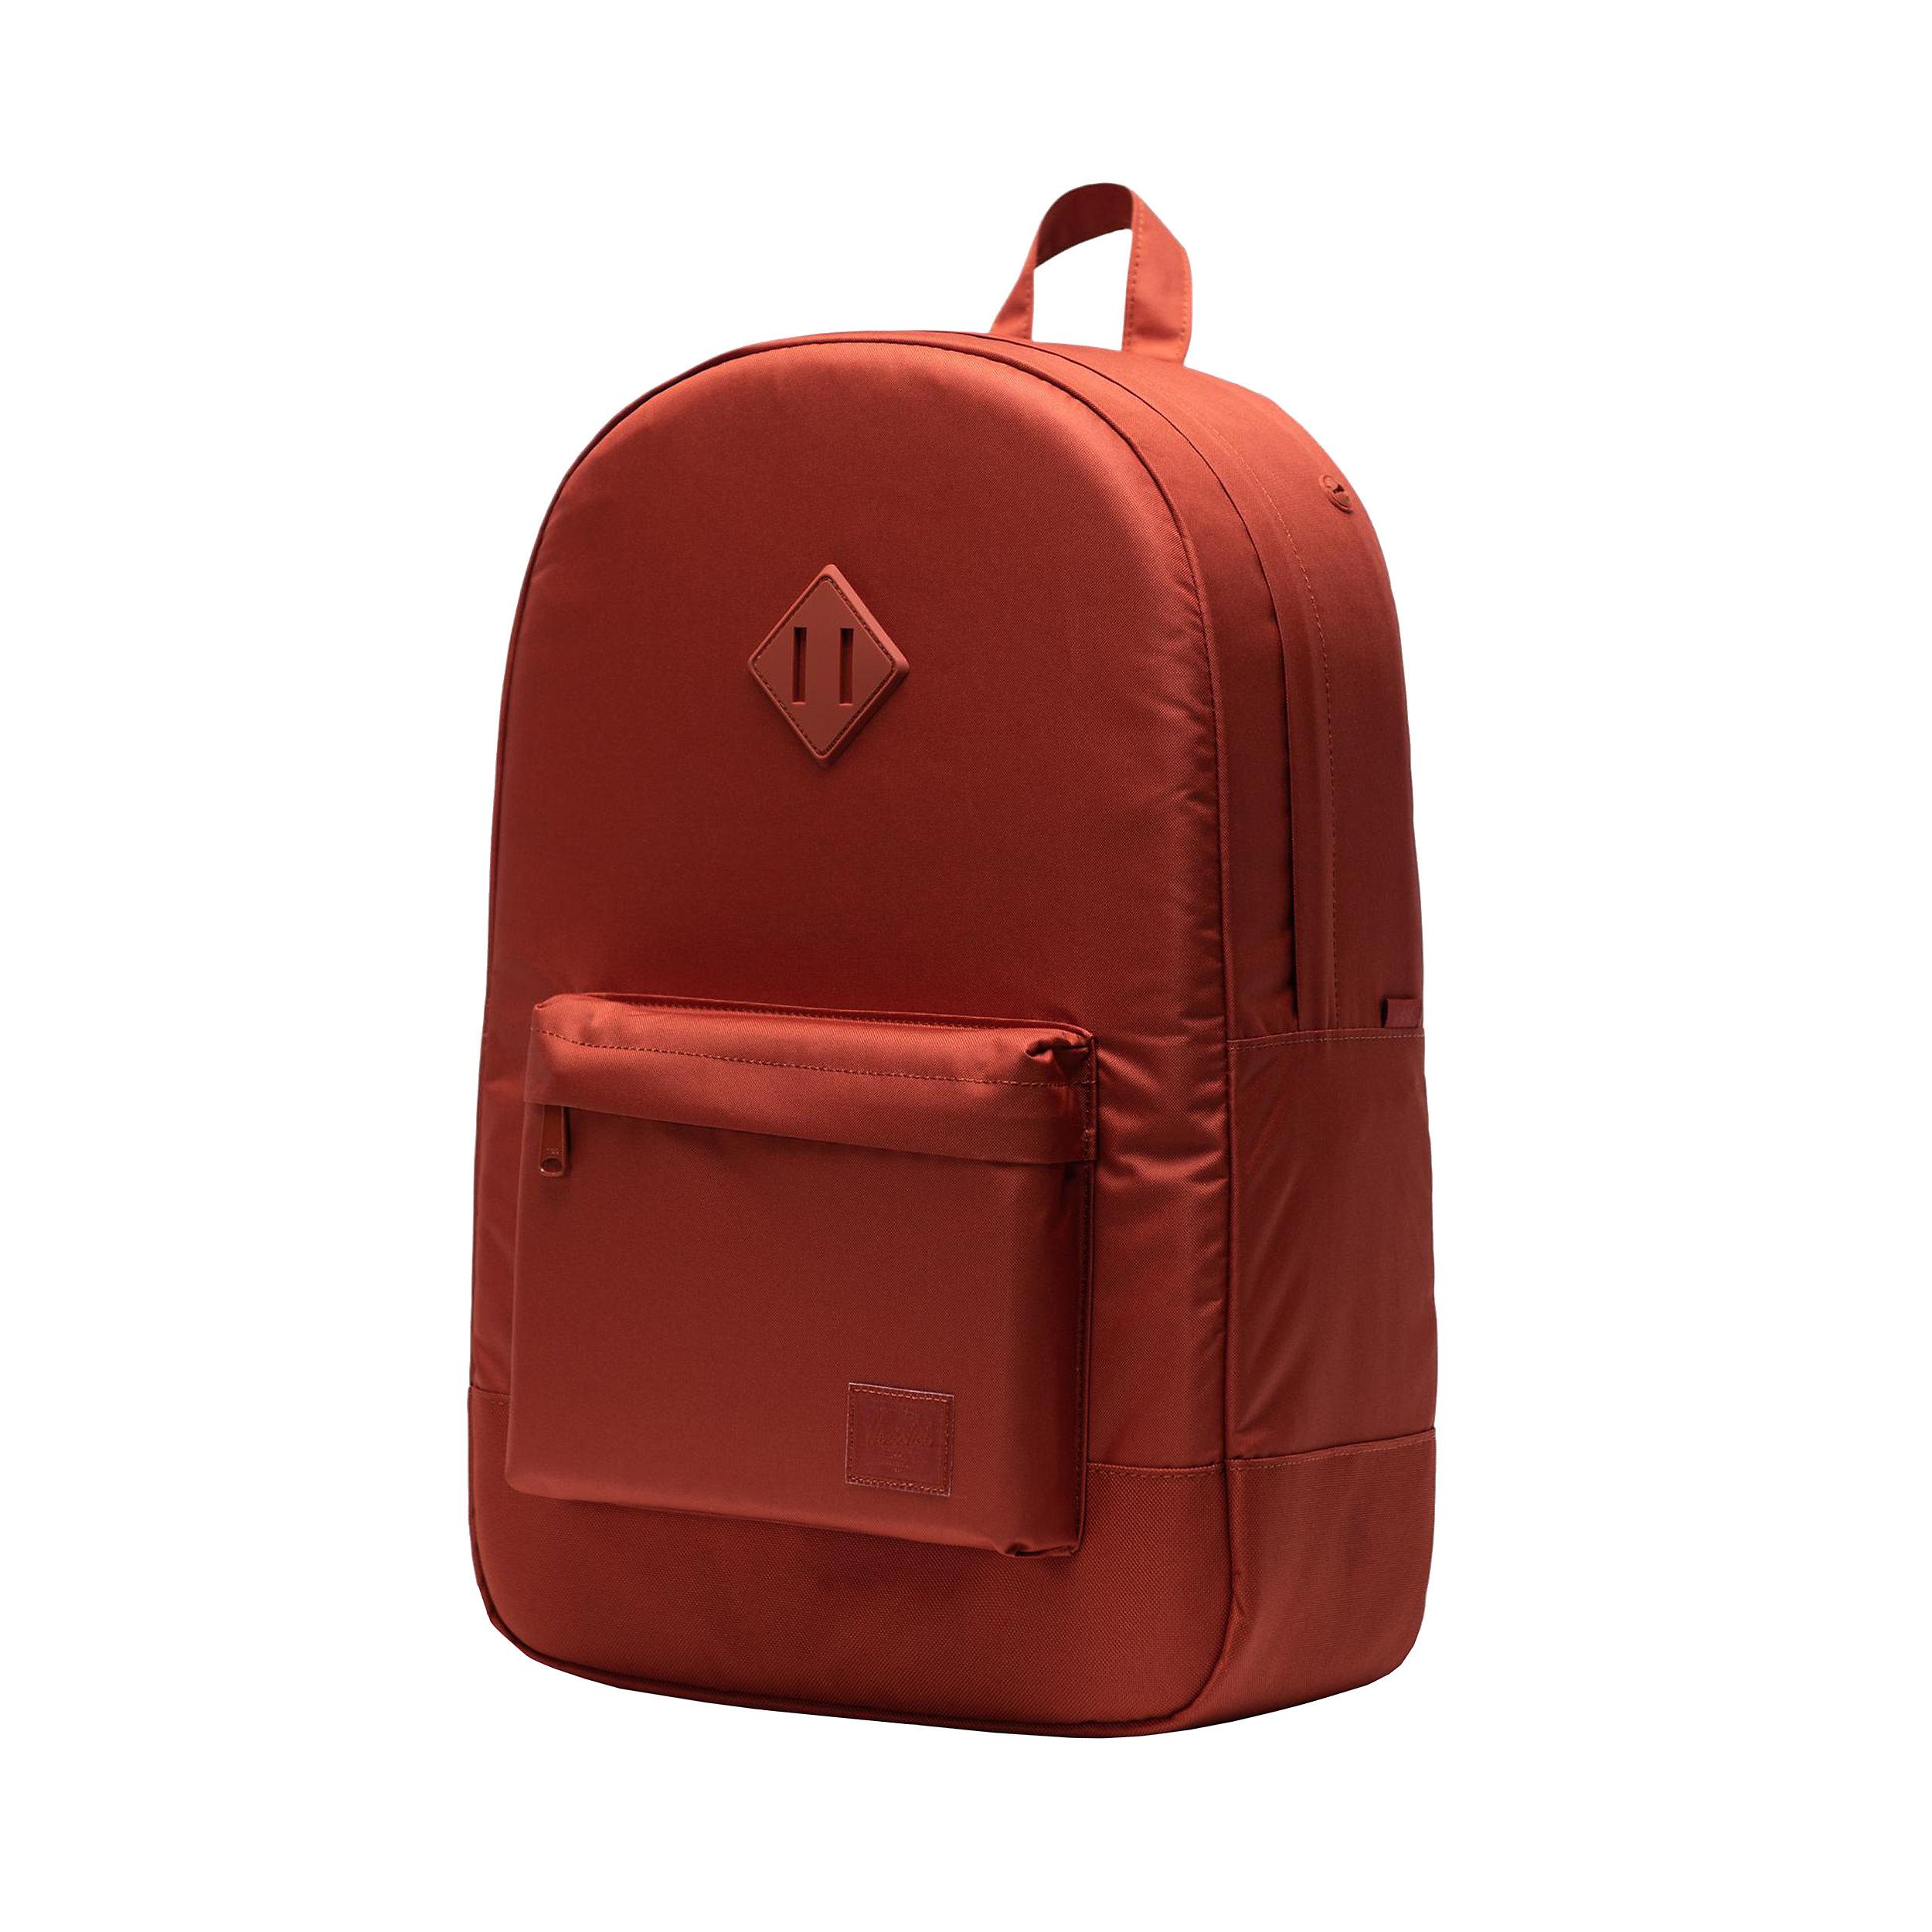 Backpack Heritage Light 15 Inch Classic Light 21 Liter